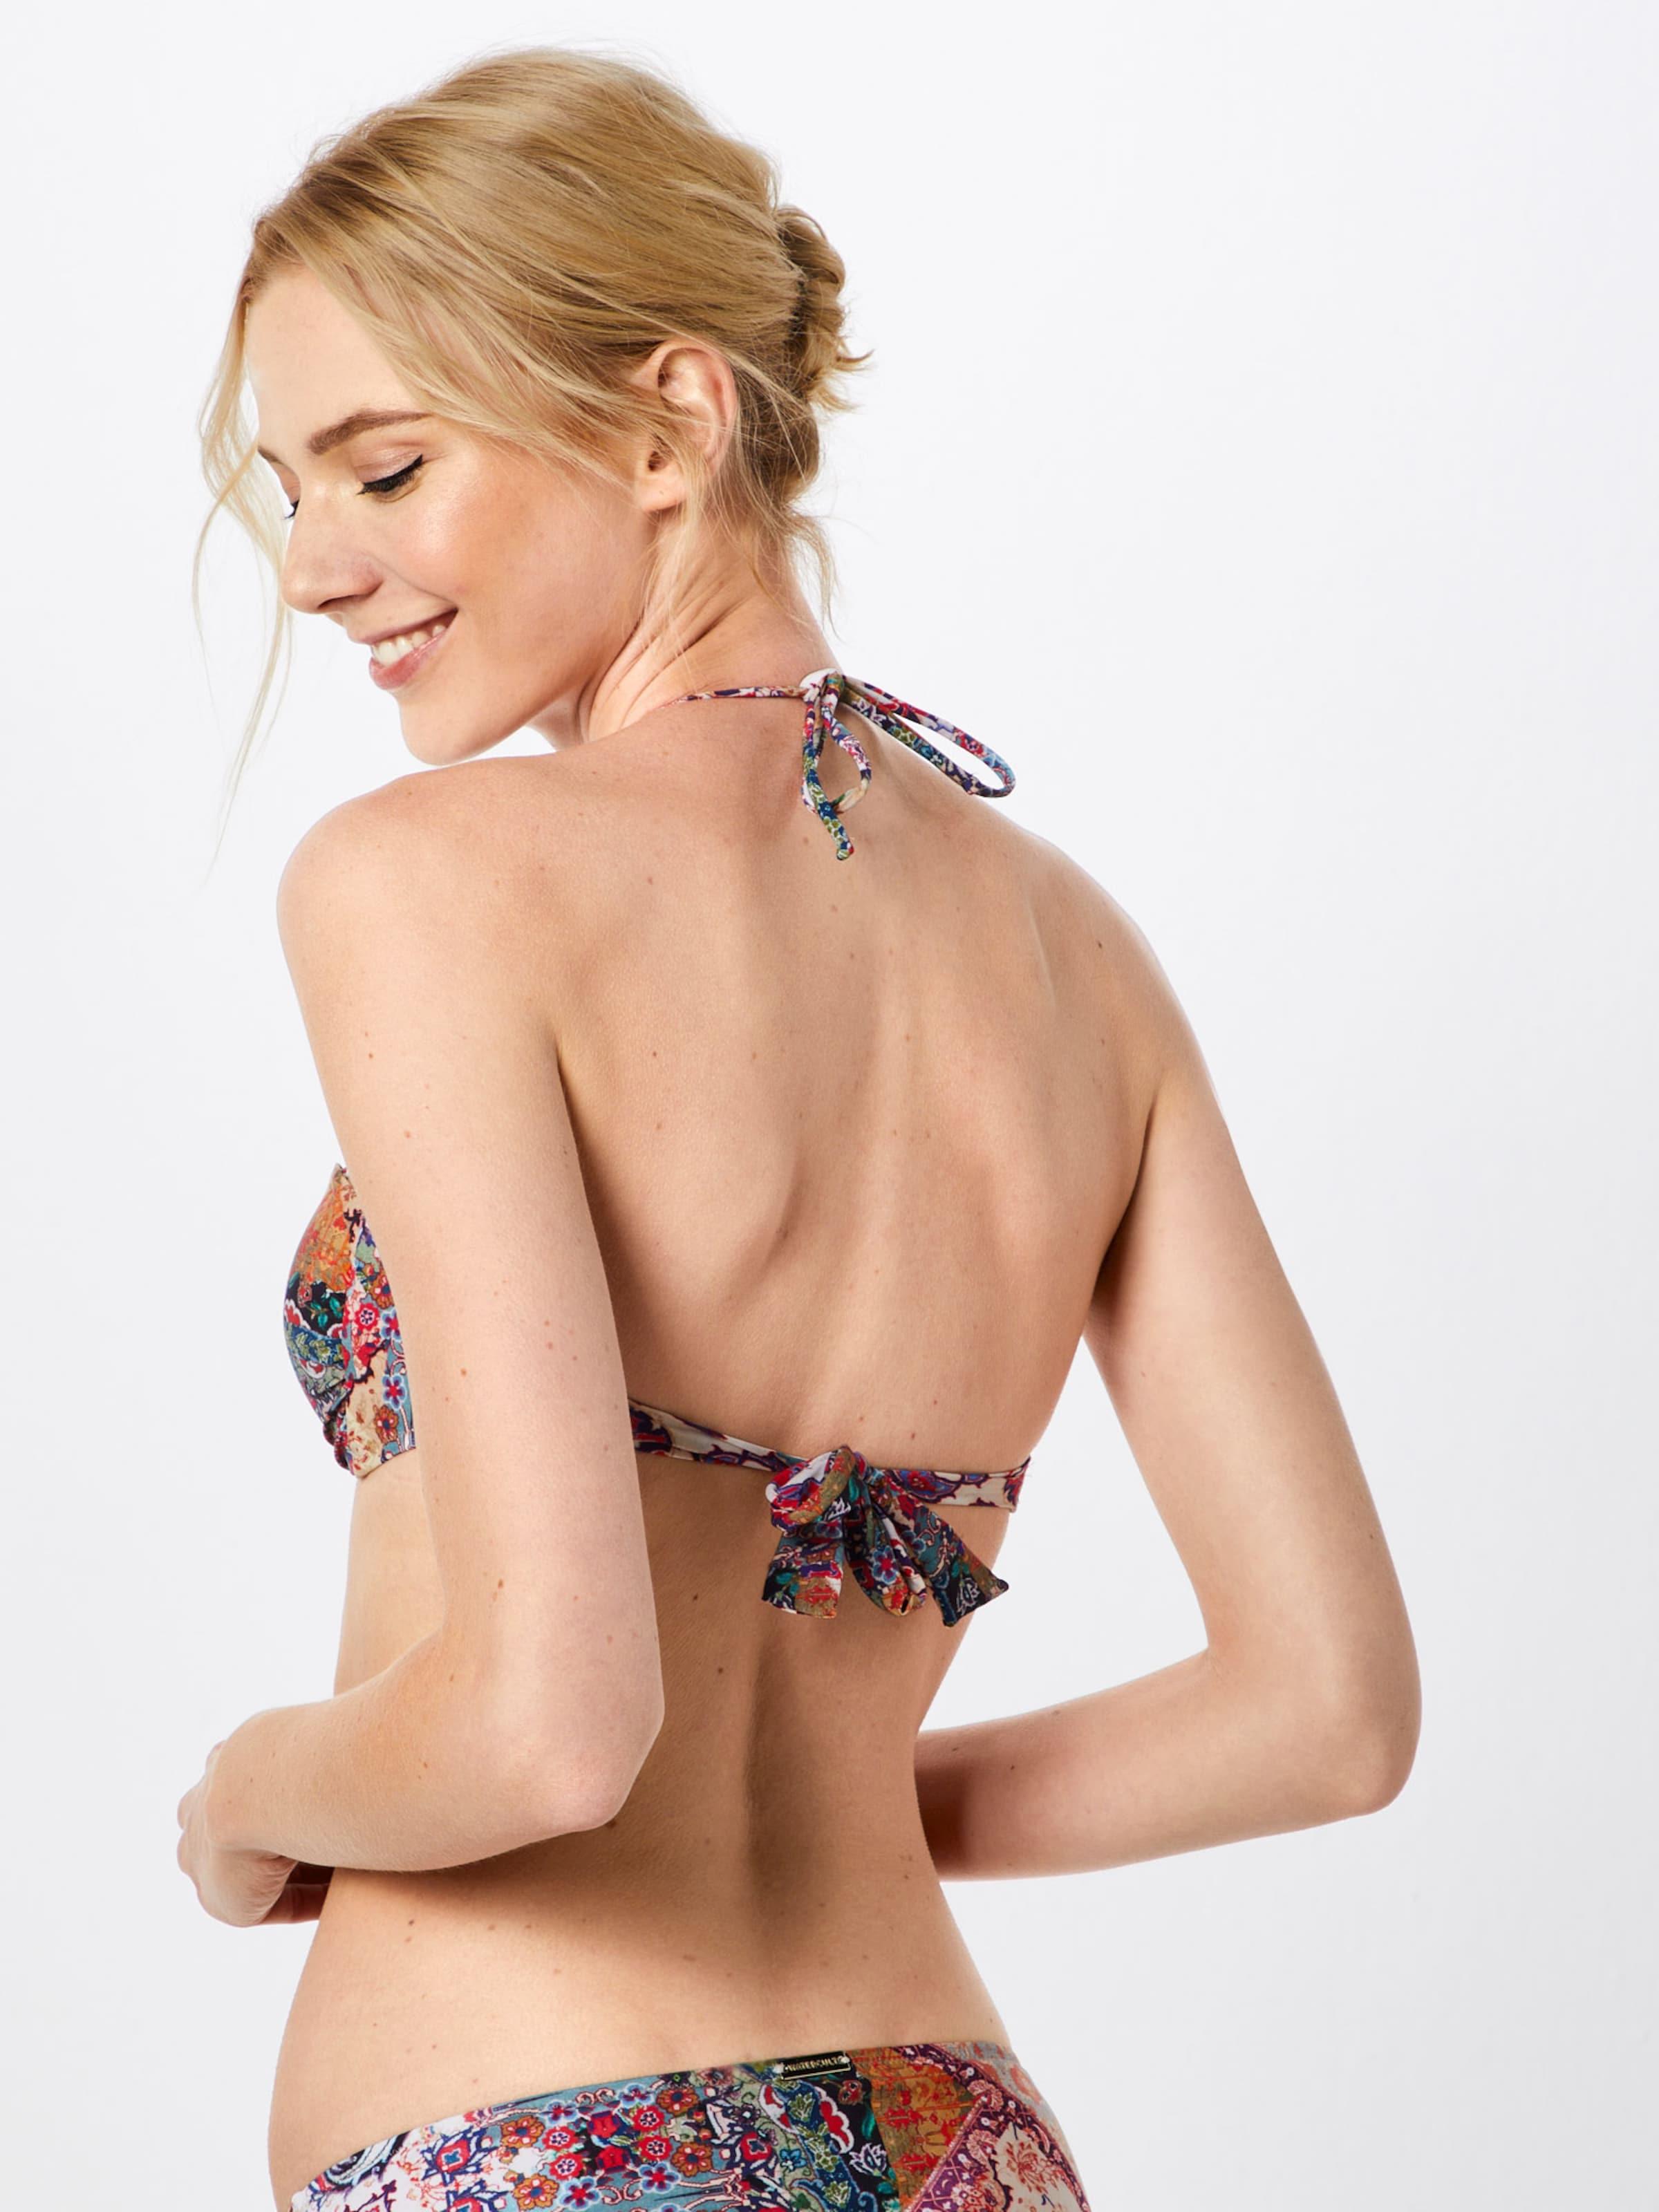 Watercult Hauts Mélange De Couleurs Bikini En HWD2EY9I